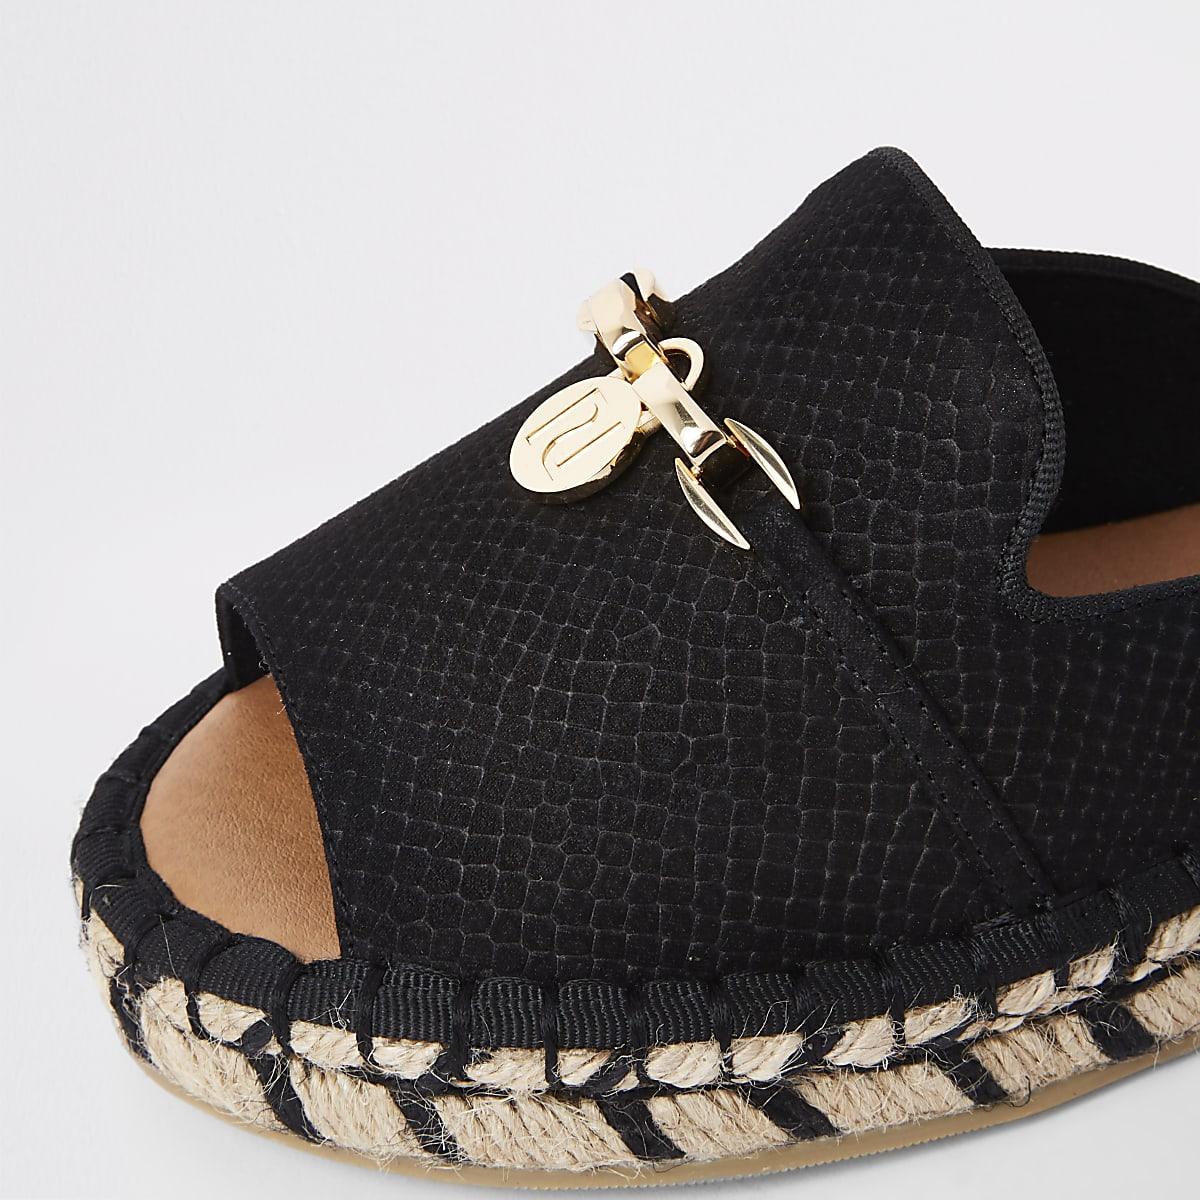 e2e50fa3f4 Black espadrille peep toe wide fit sandals - Shoes - Shoes & Boots ...